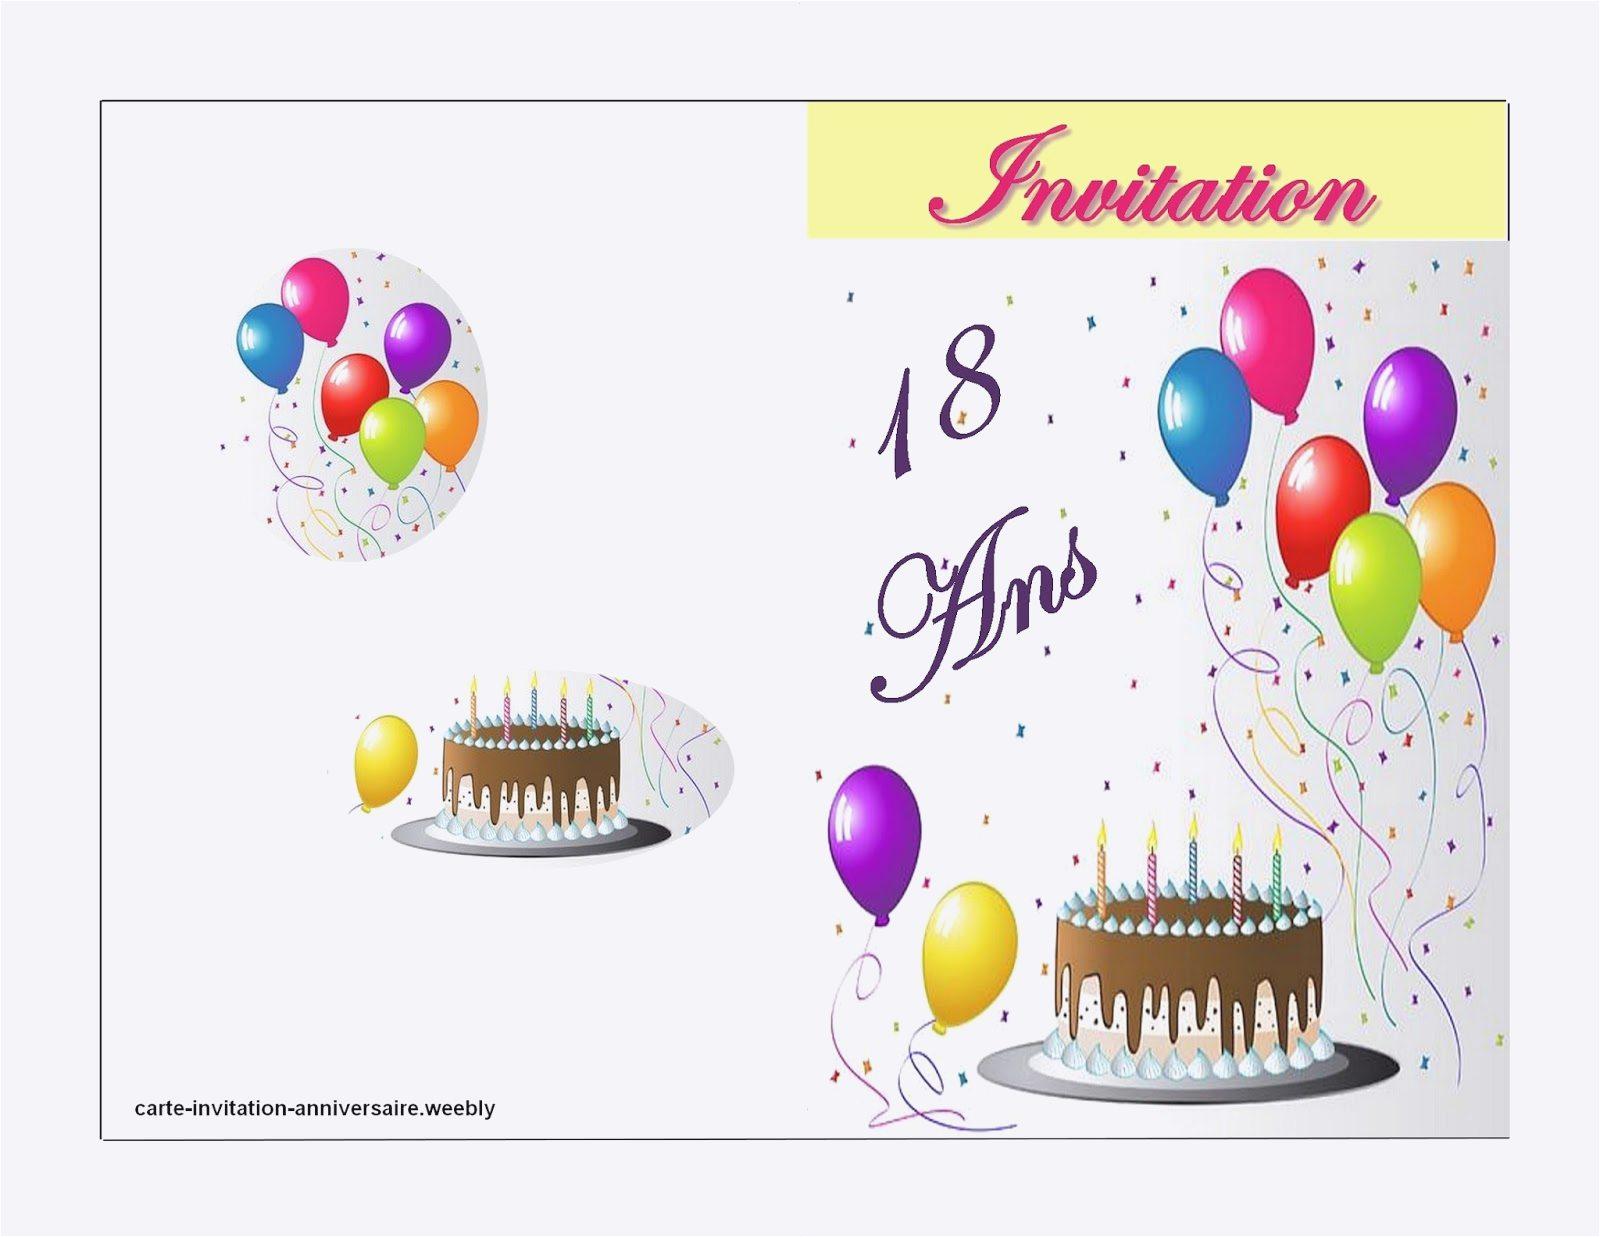 Carte anniversaire retraite gratuite imprimer